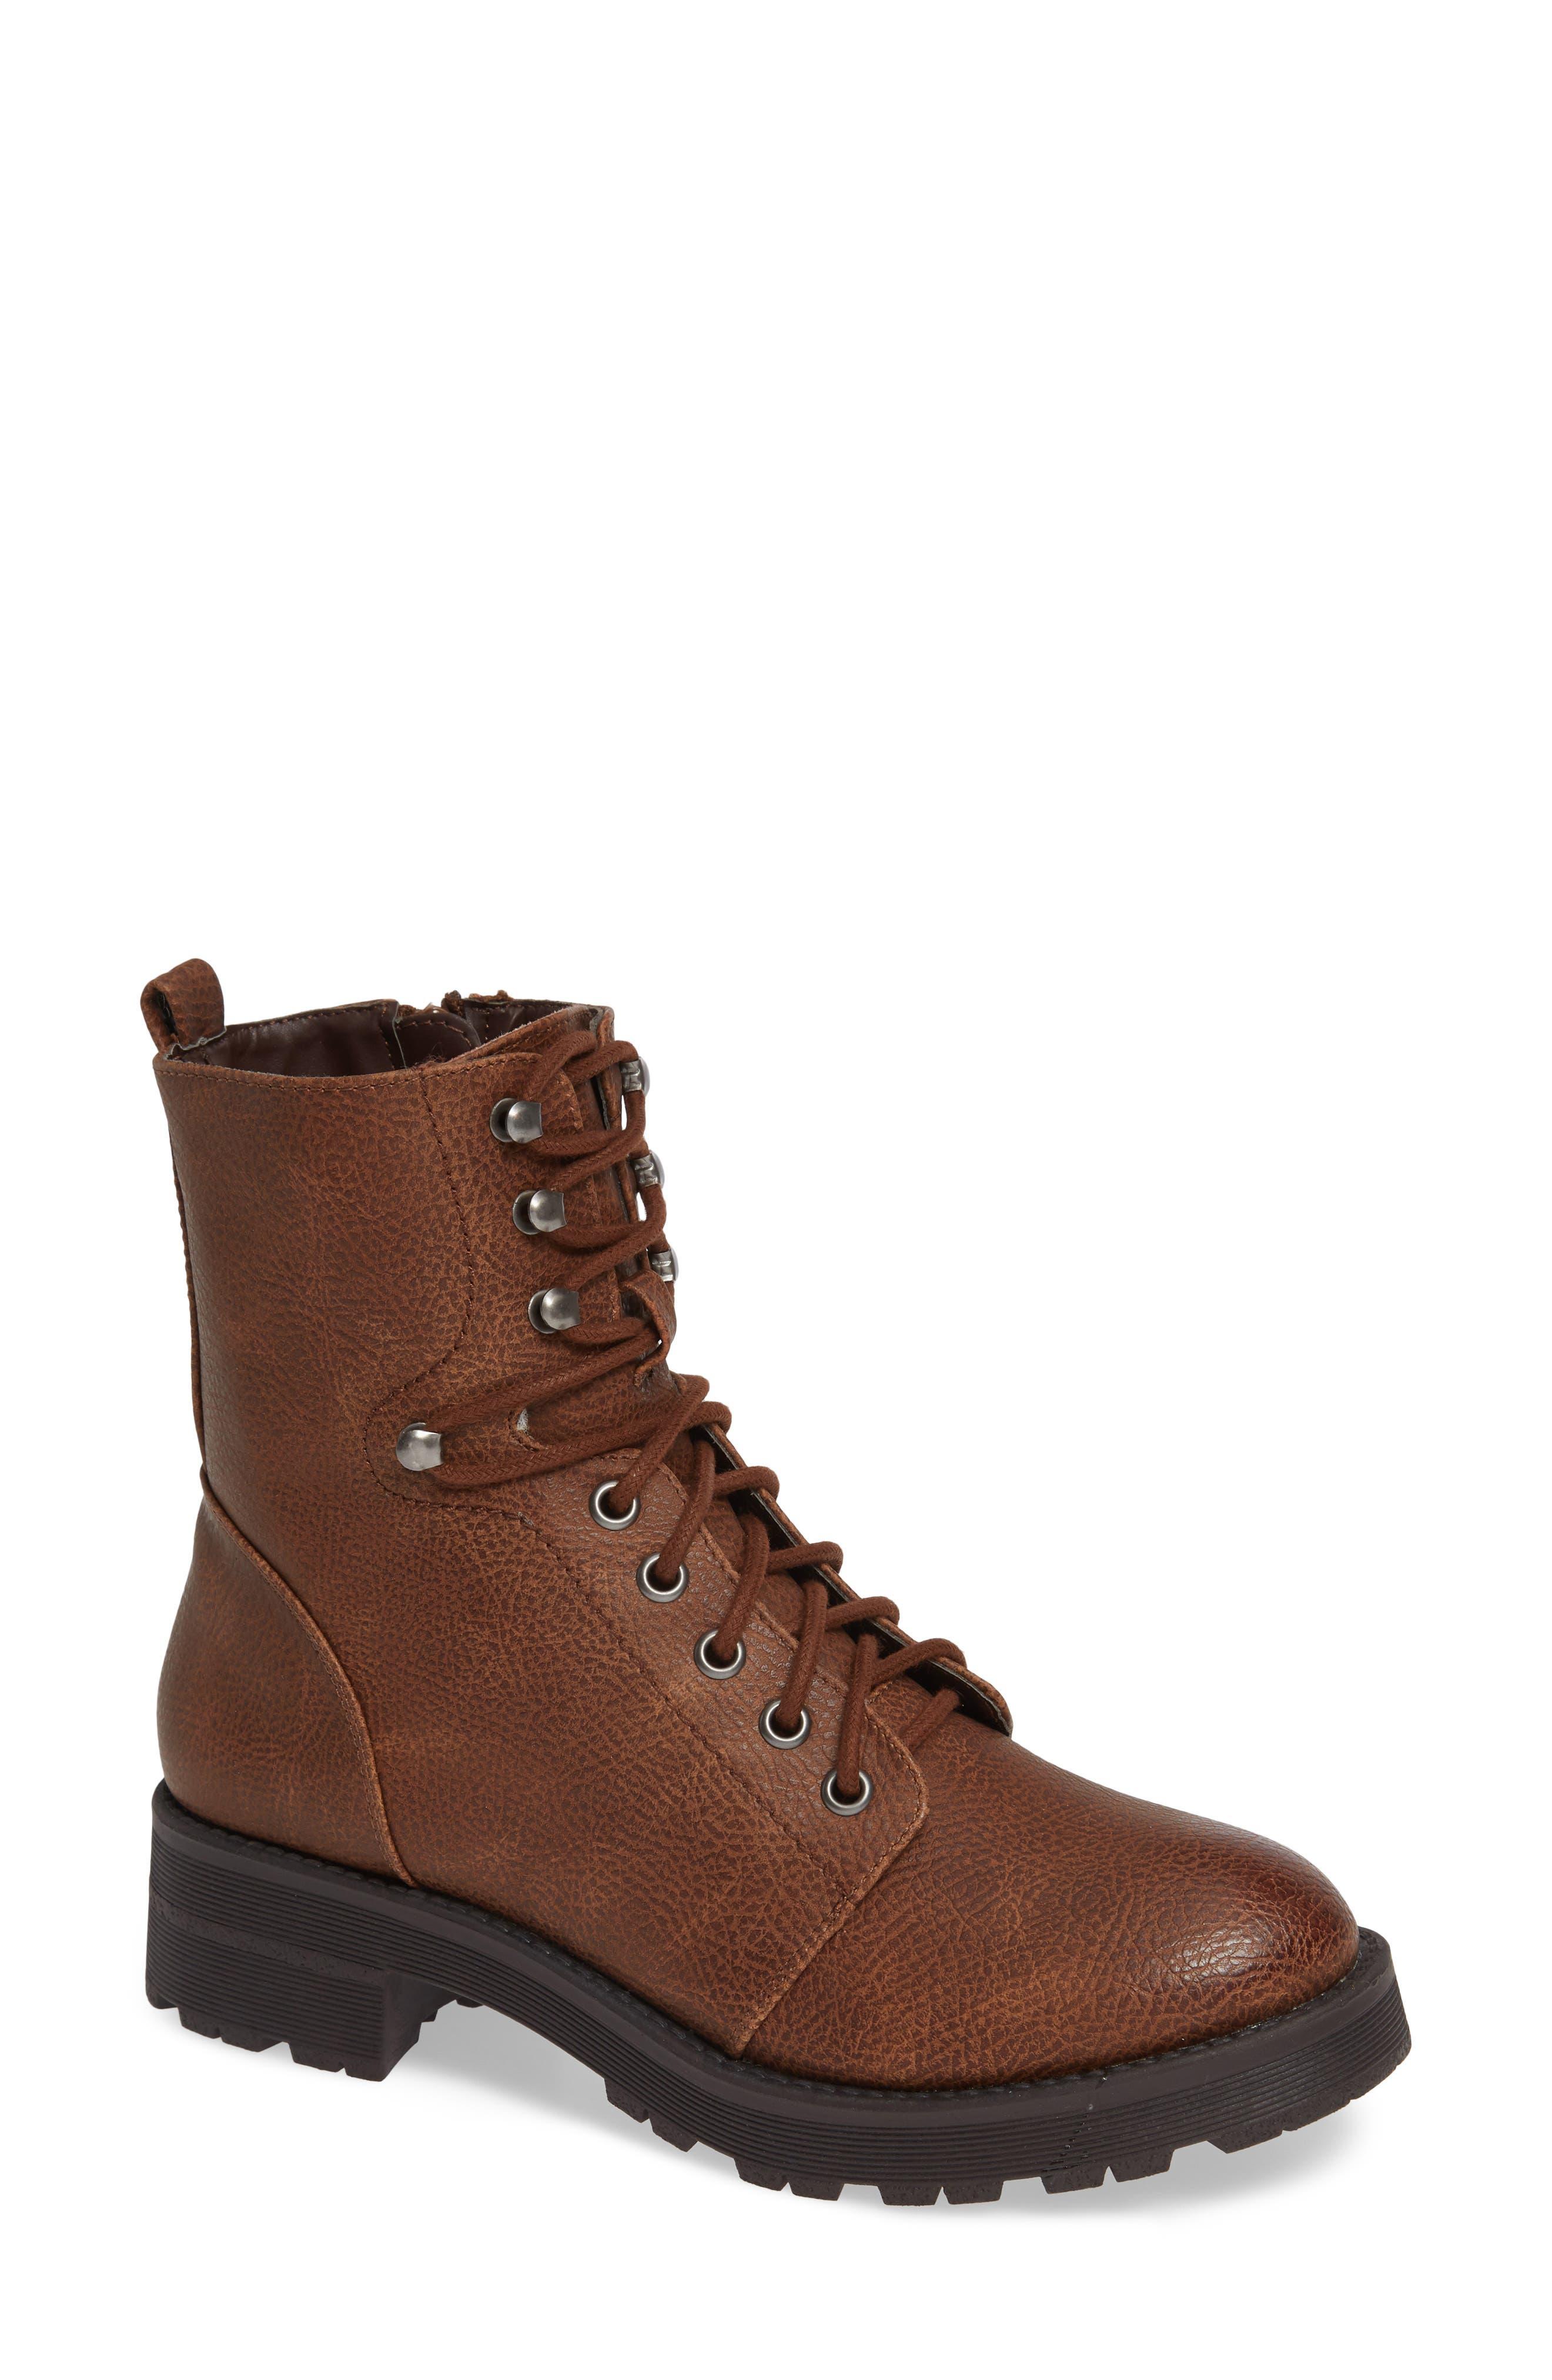 Mia Indigo Boot, Brown